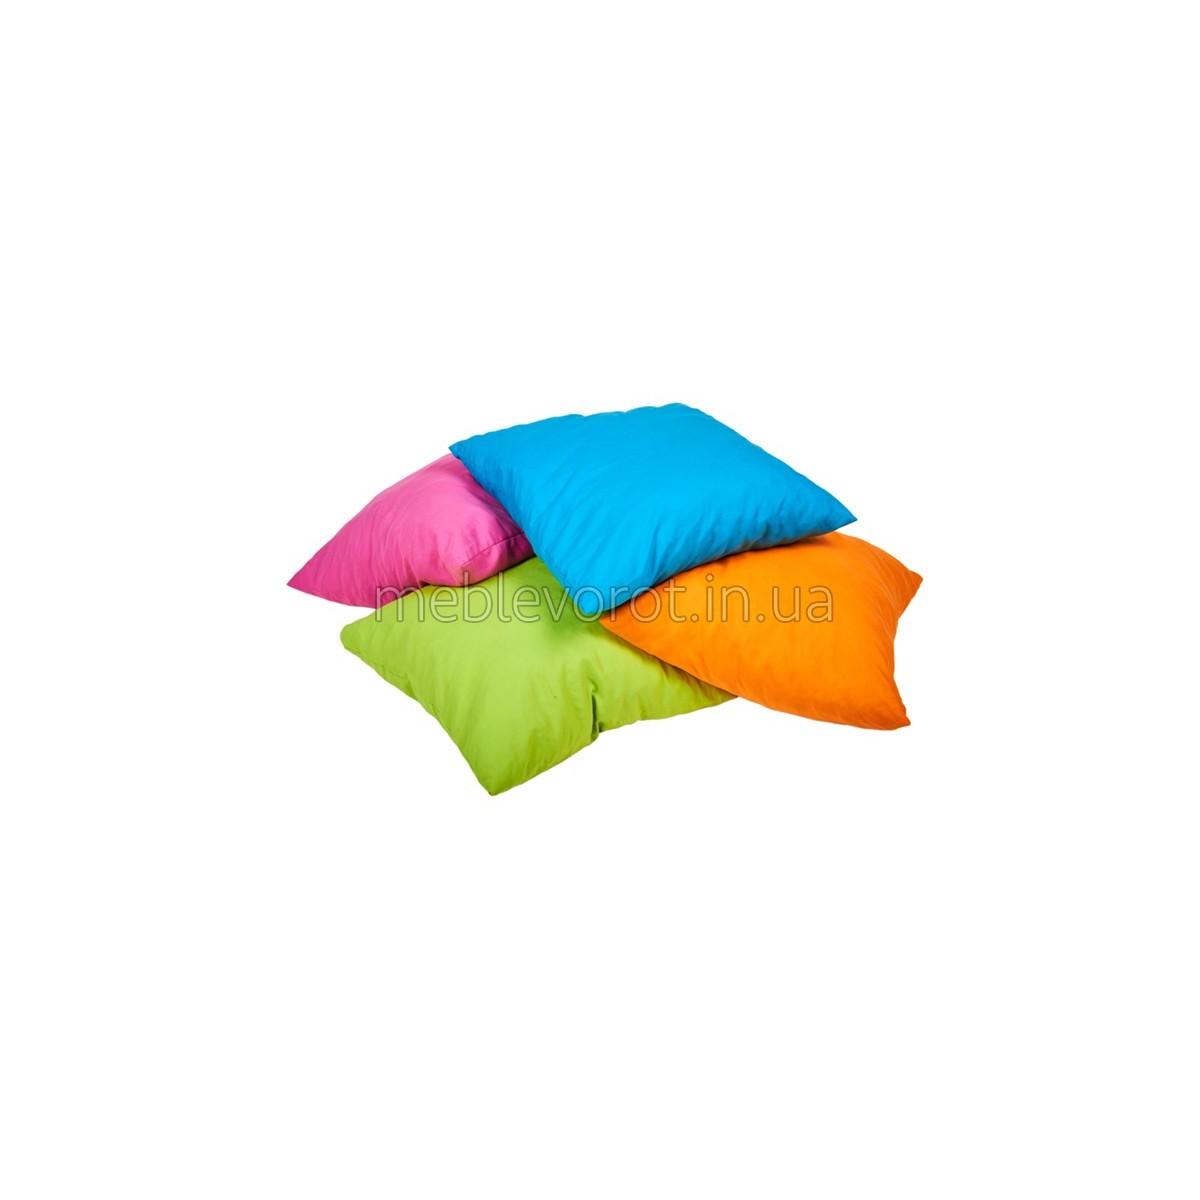 Подушки разноцветные (Аренда)